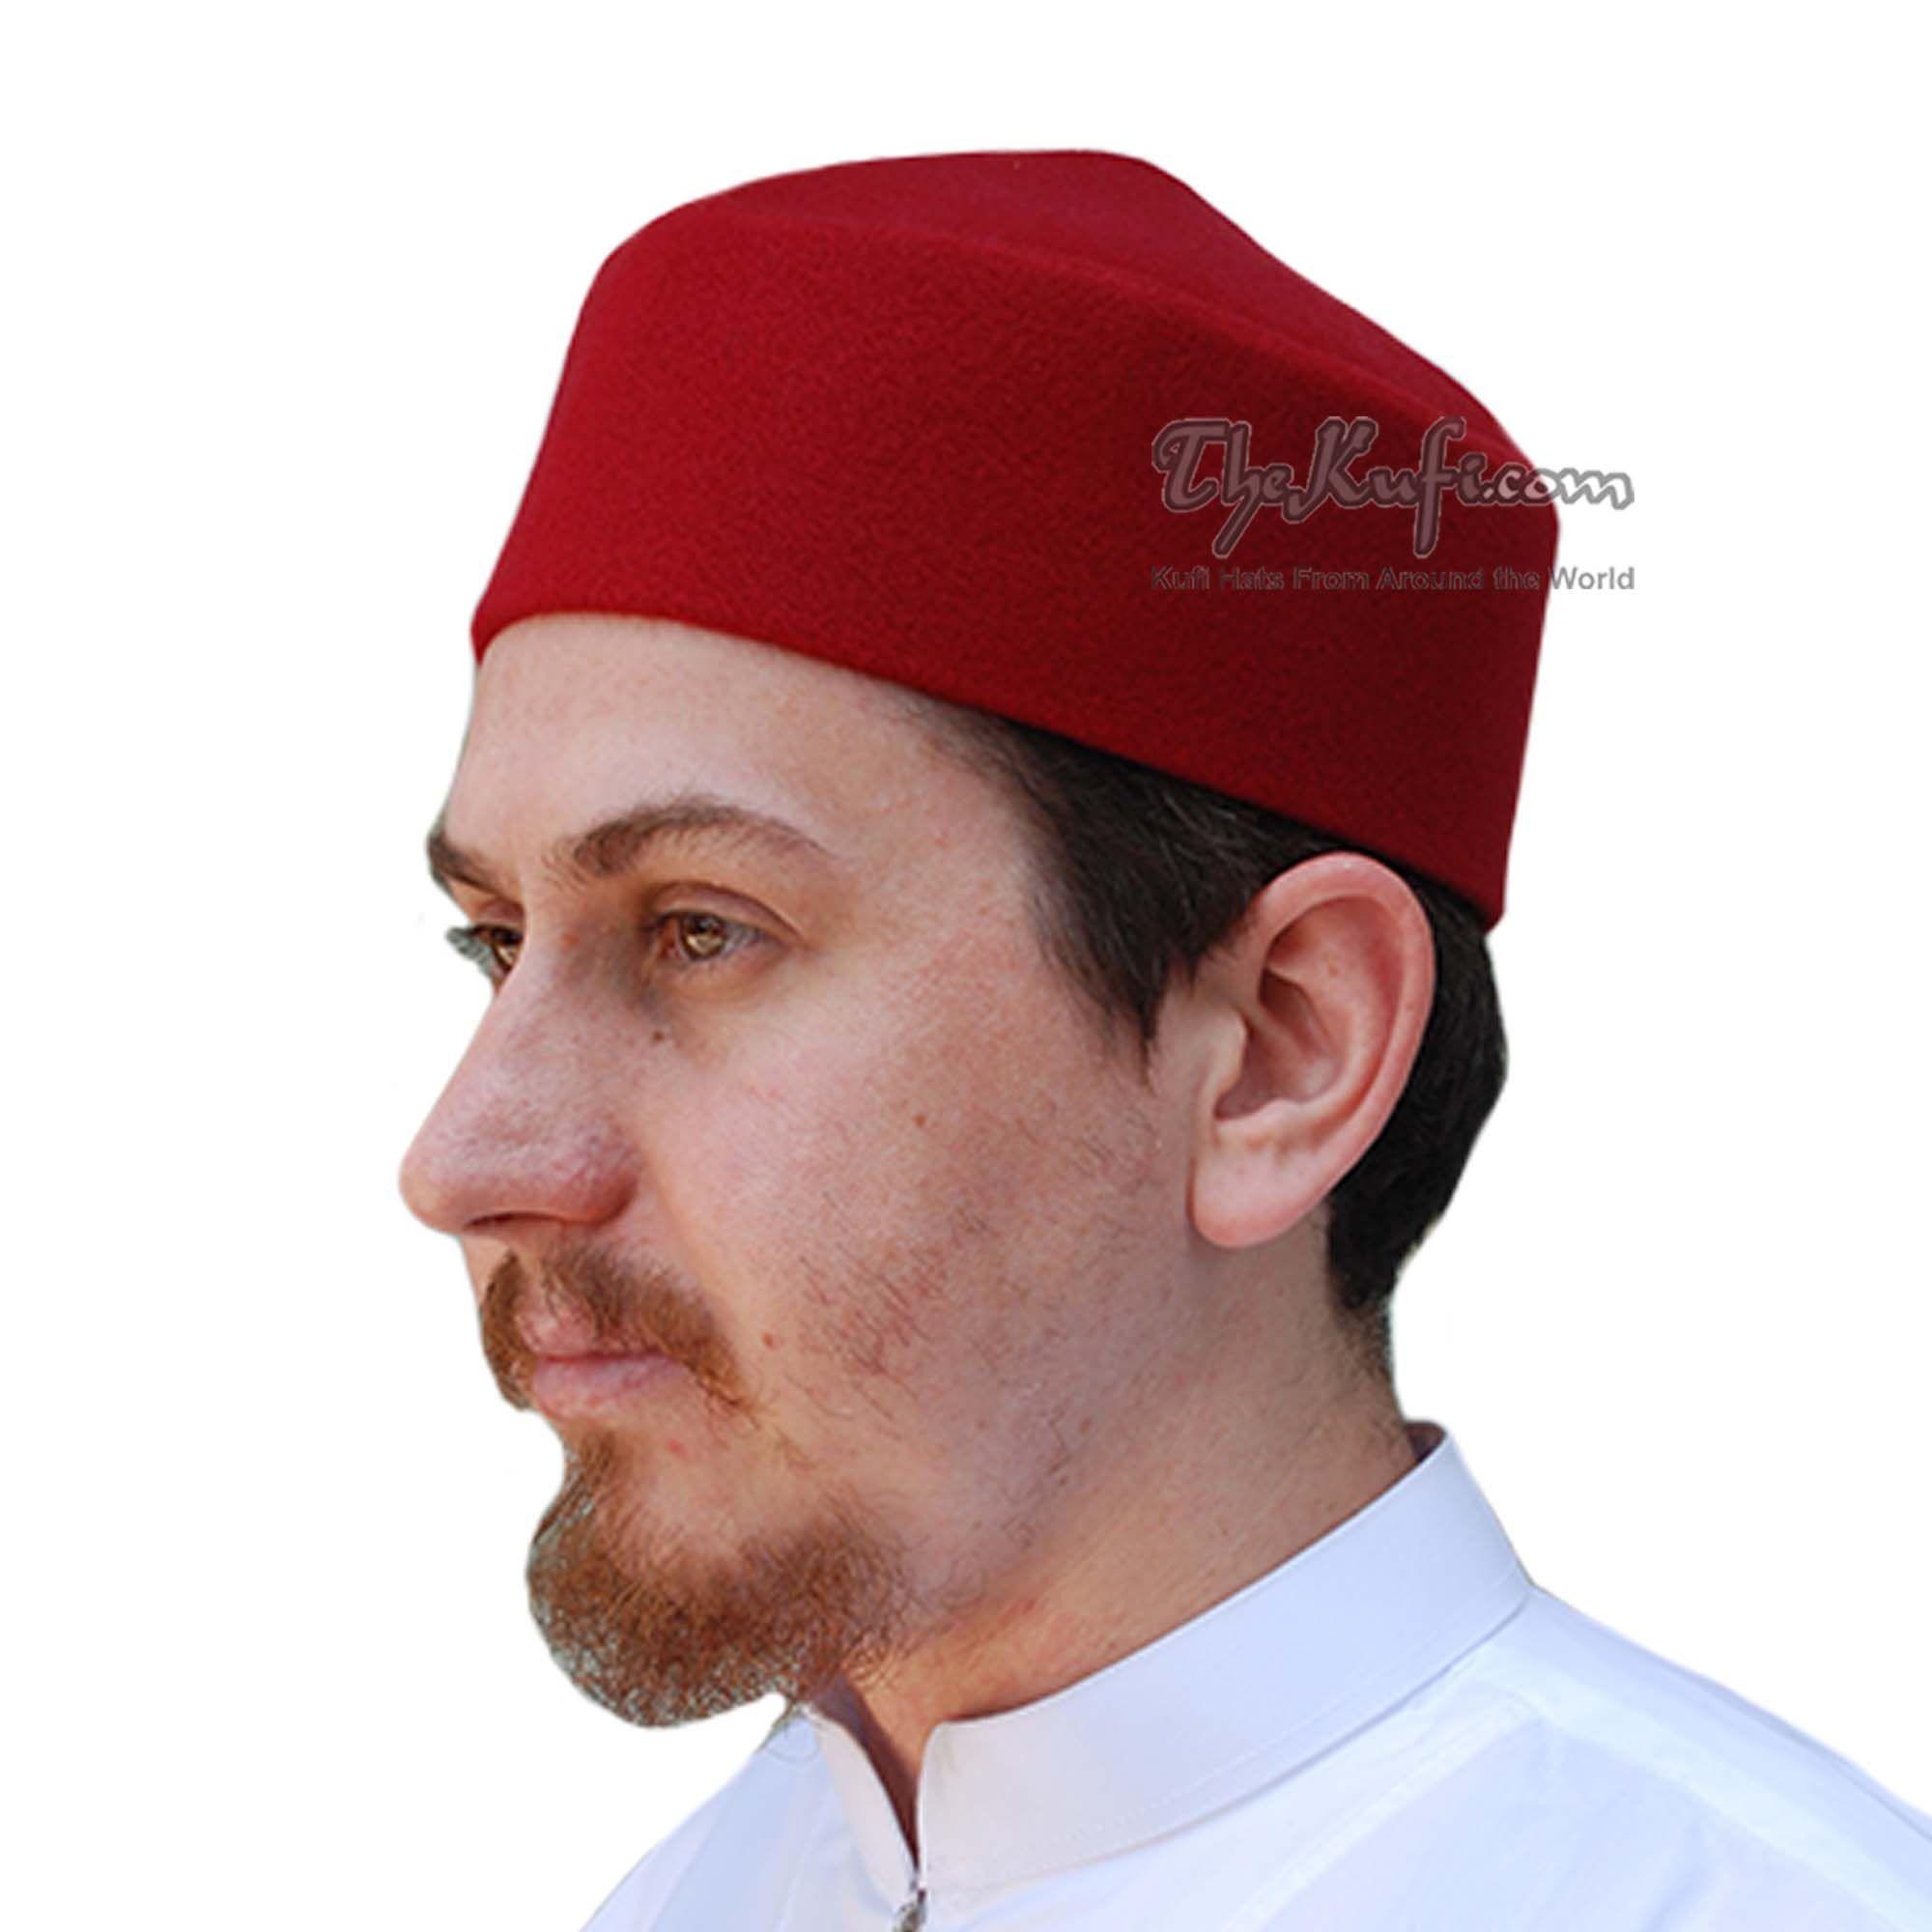 Thekufi Handmade Pointed Top Maroon Faux Felt Kufi Thekufi Hats For Sale Faux Maroon